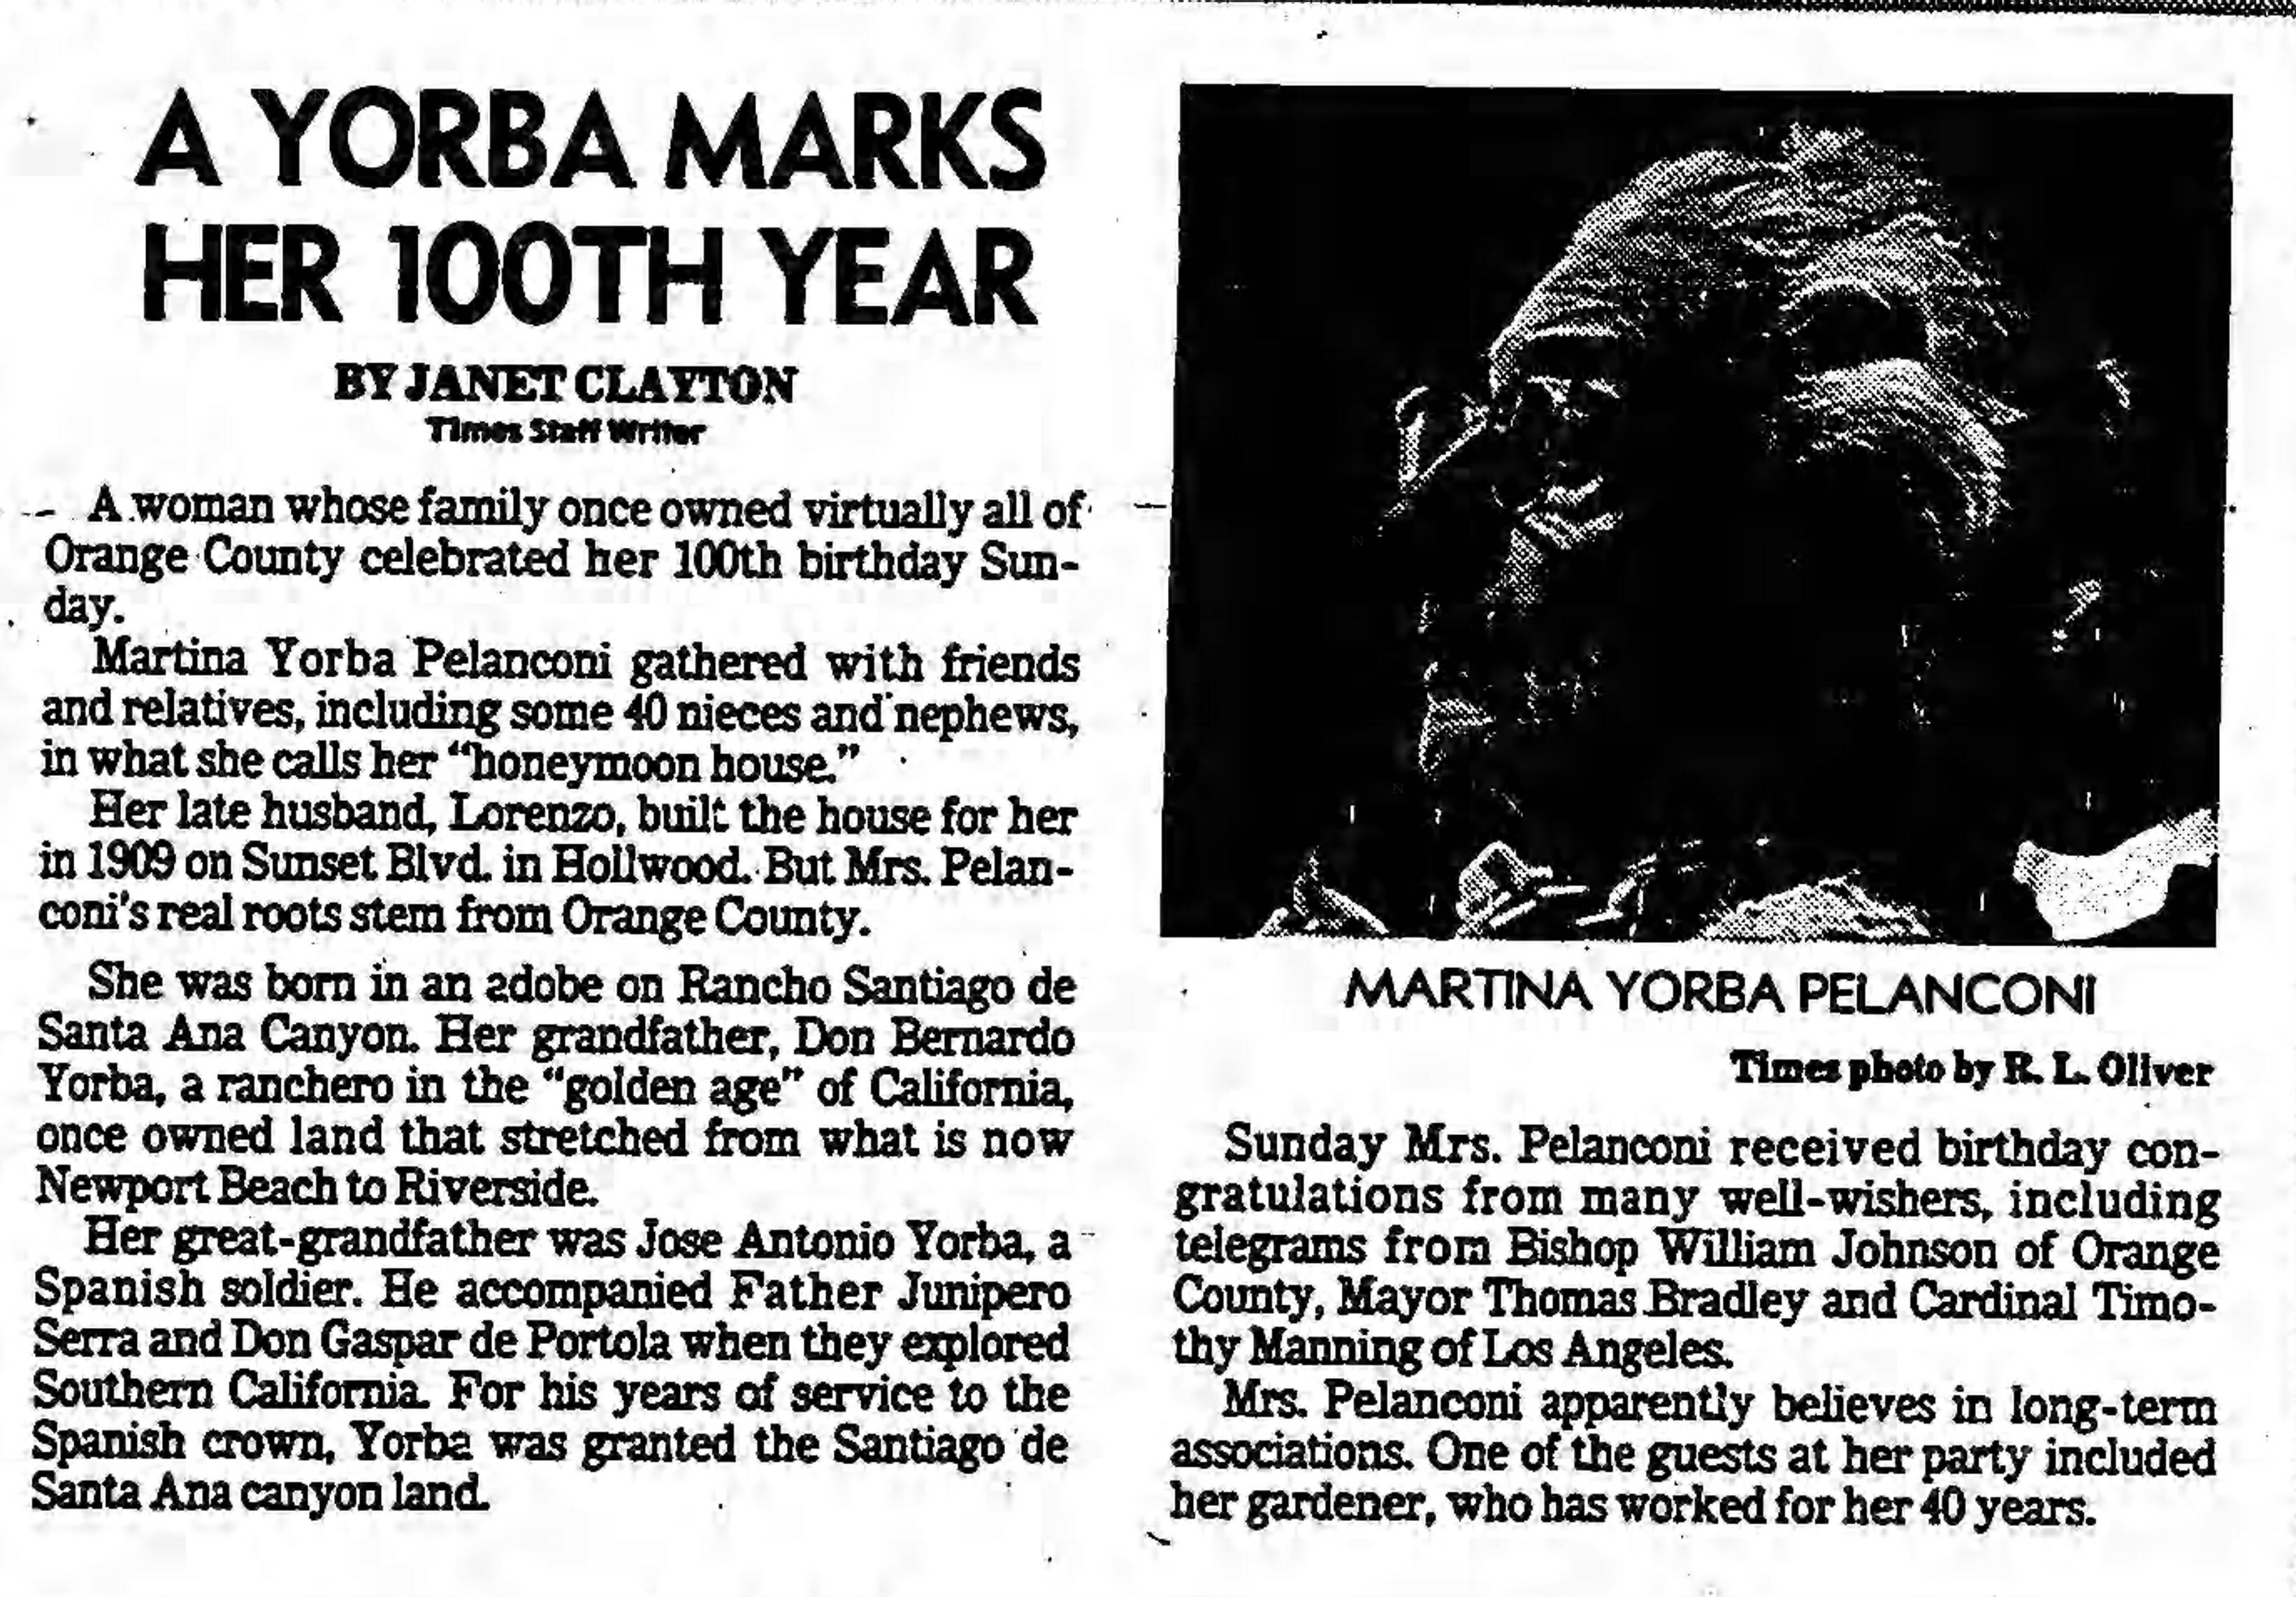 The_Los_Angeles_Times_Mon__Apr_2__1979_martina